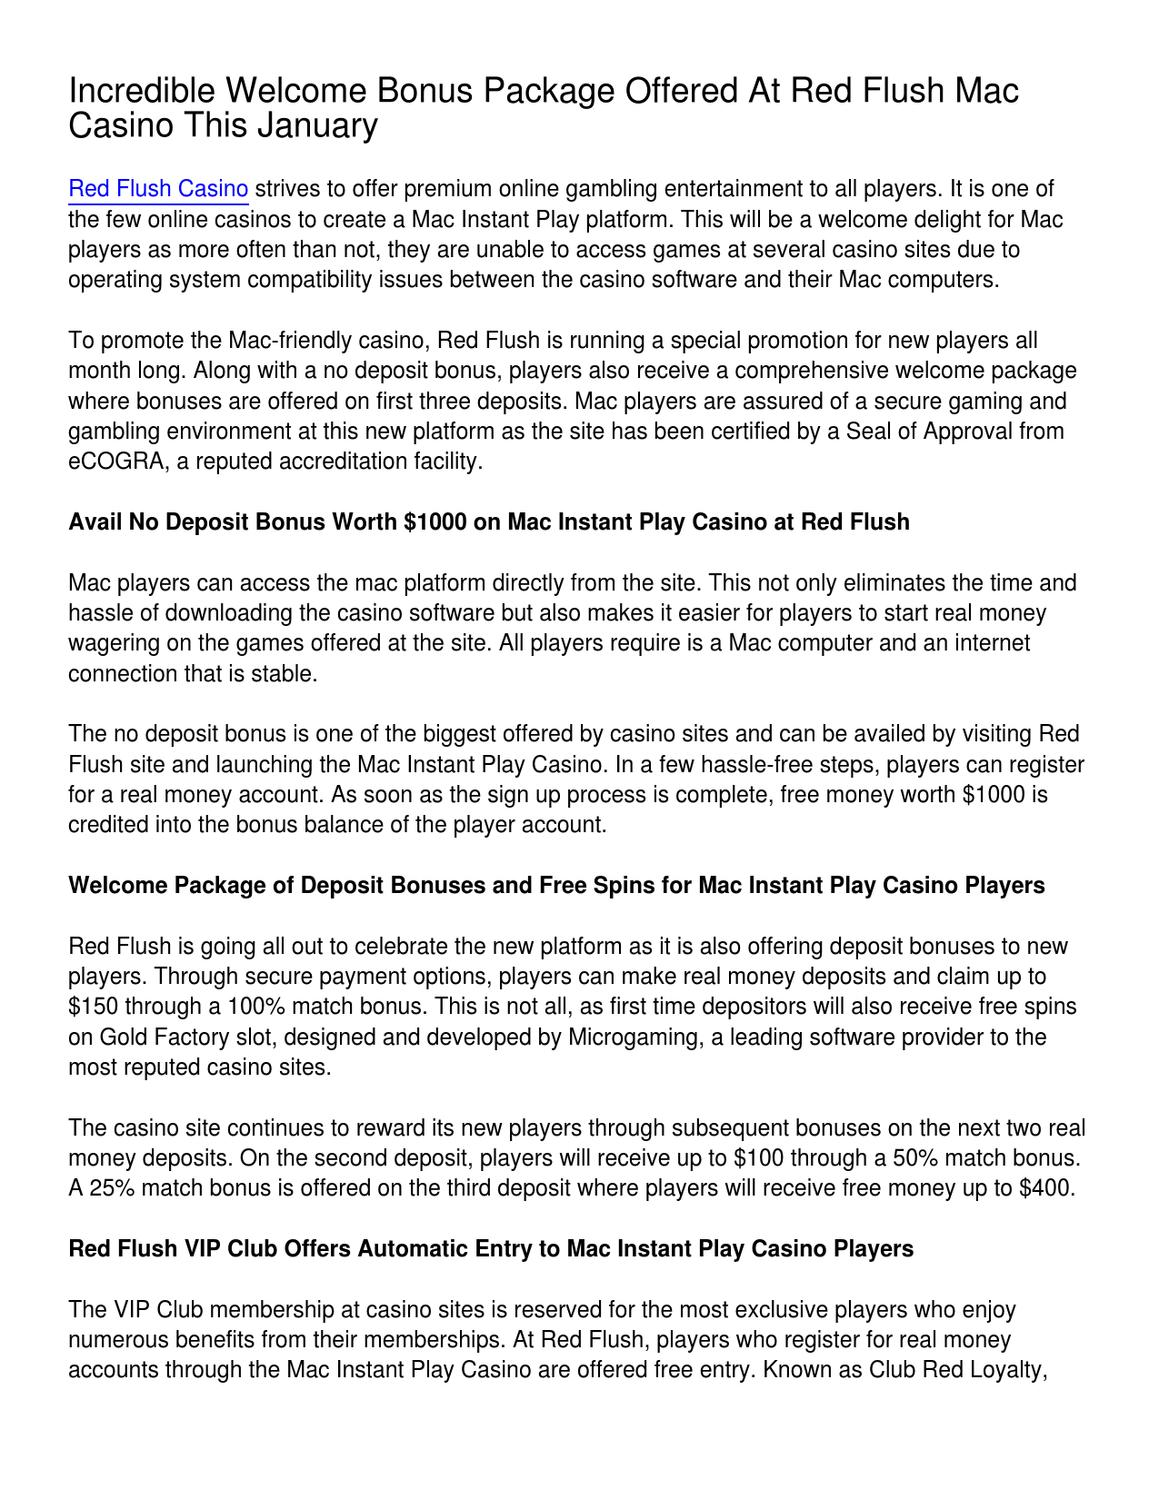 Real money online videopoker bonuses